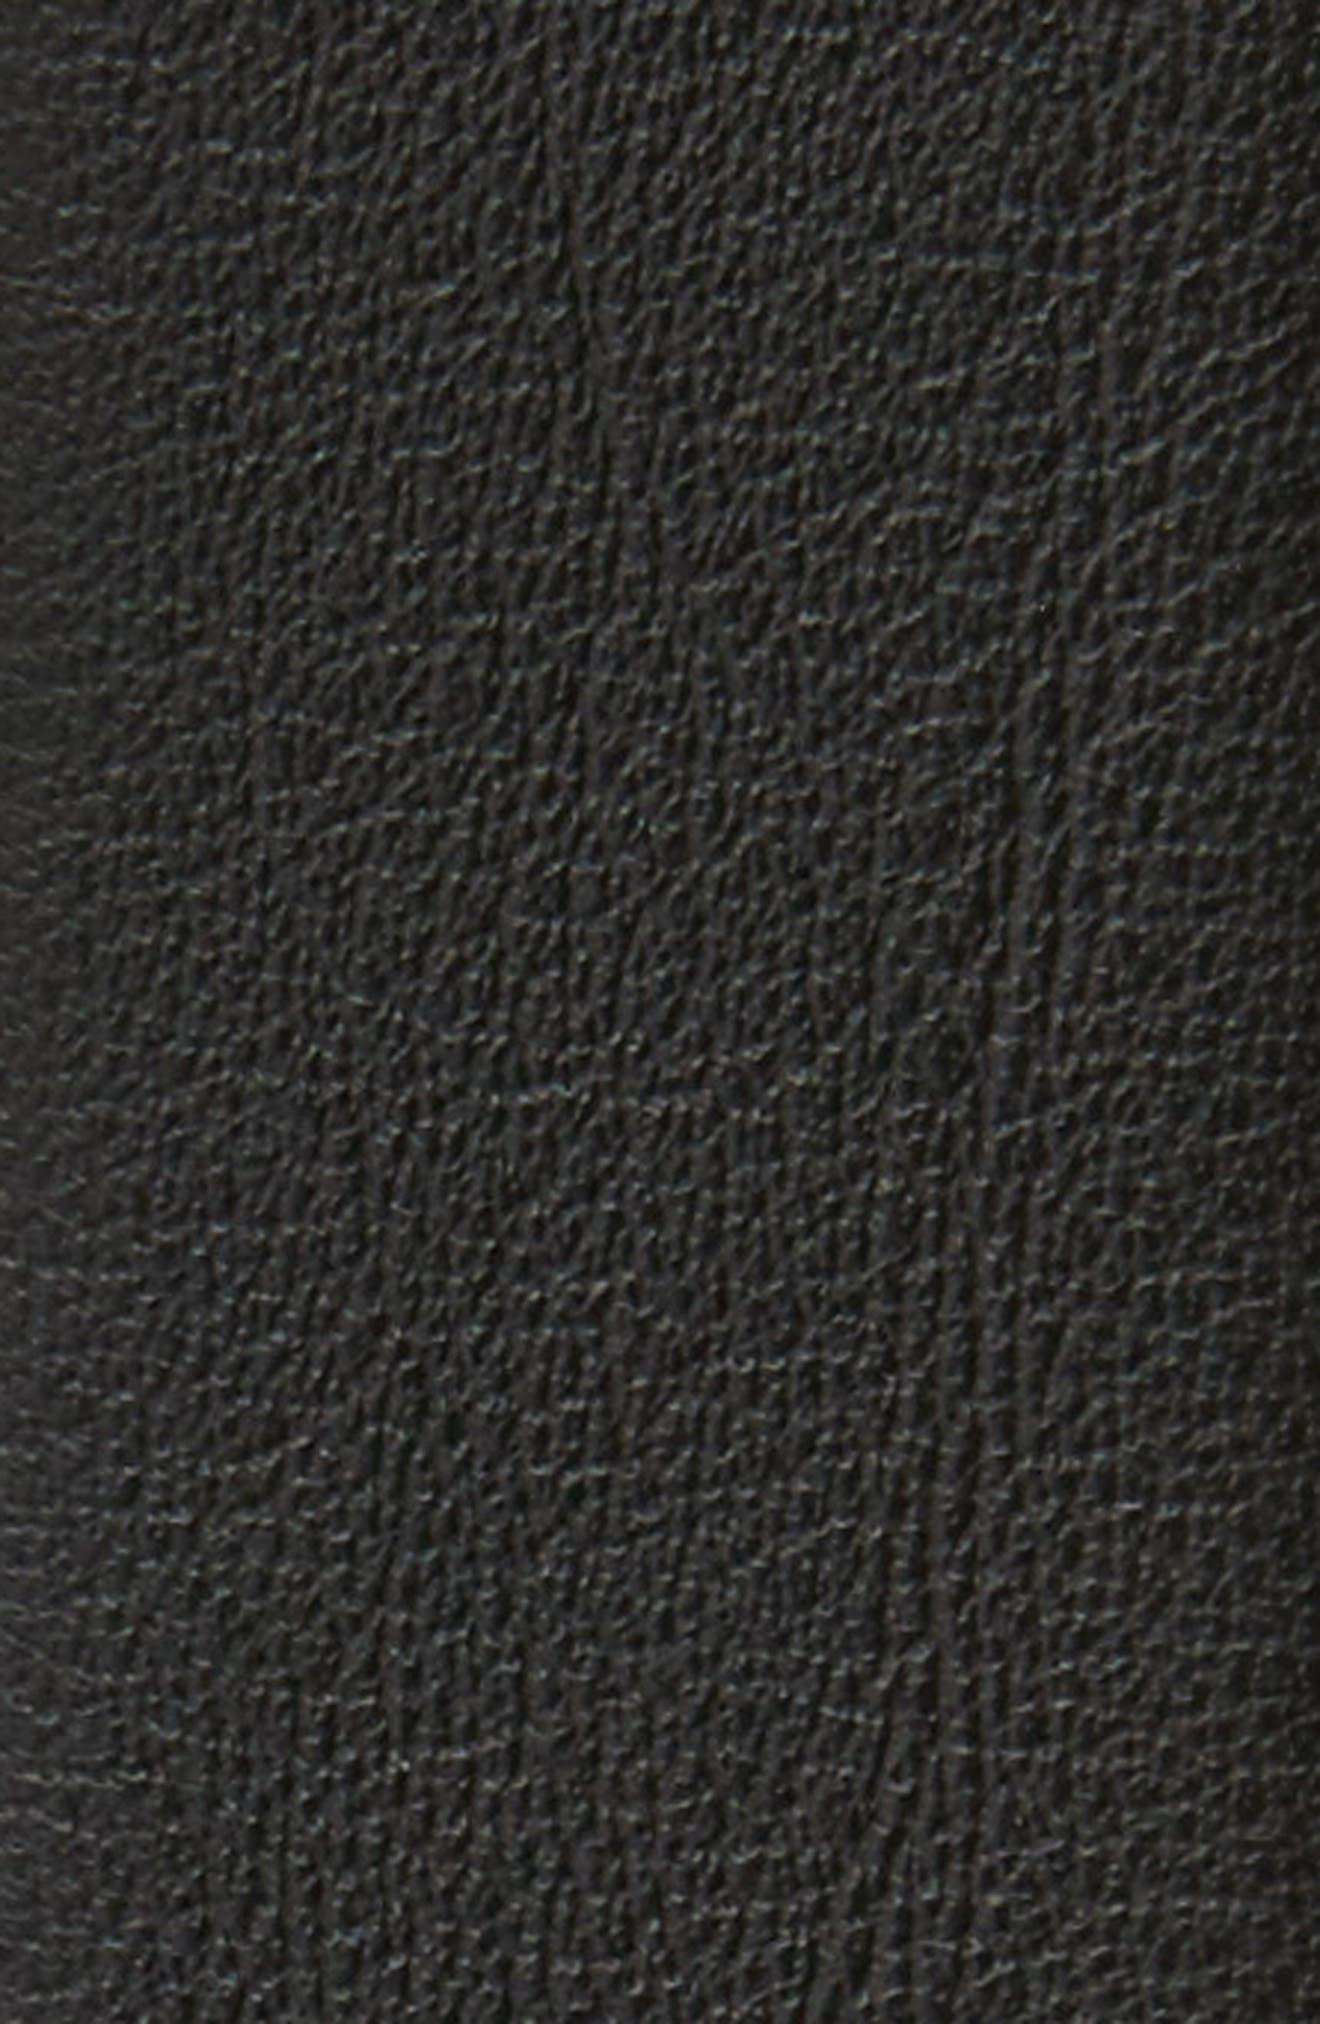 Alternate Image 2  - Monte Rosso Trieste Leather Belt